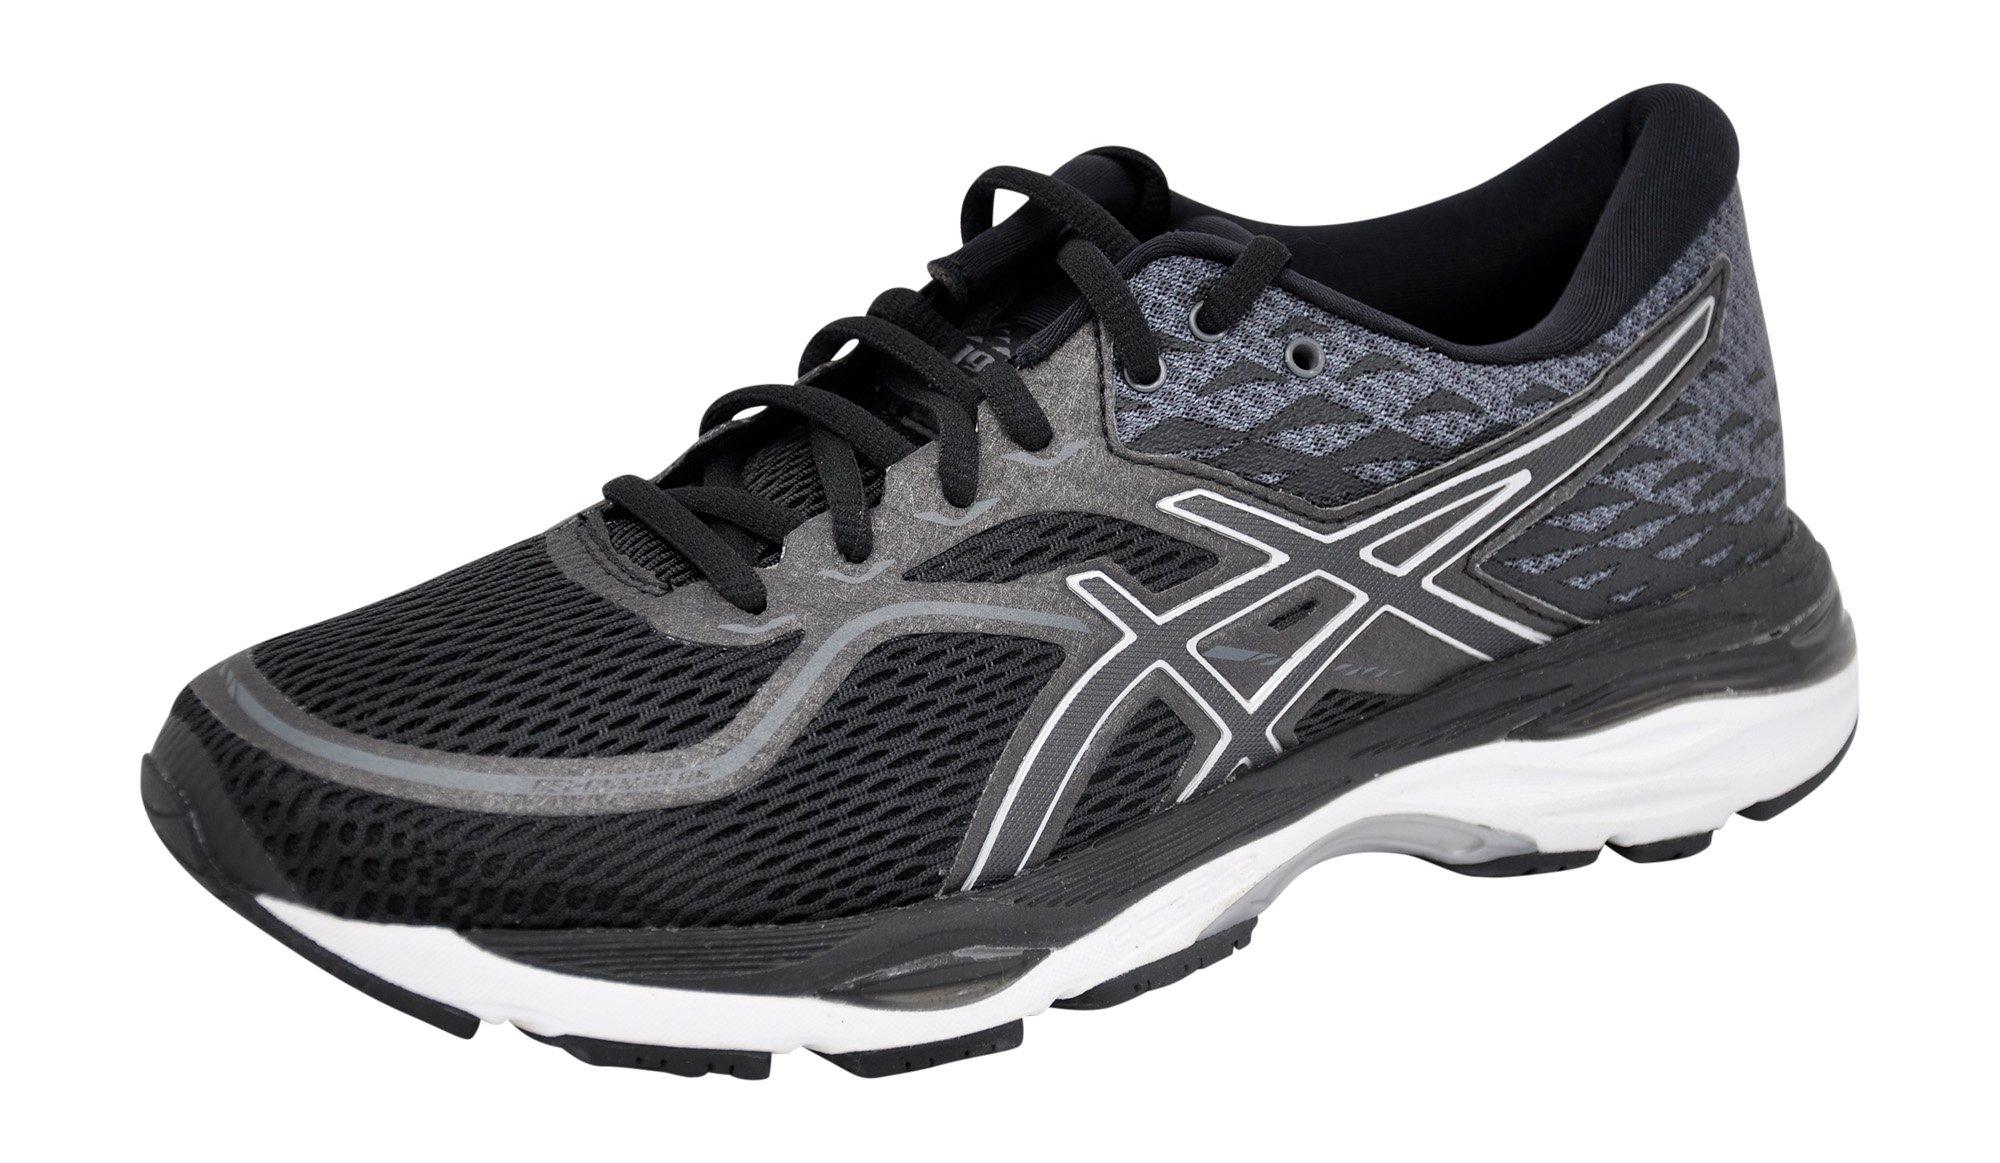 c75eefb4 ASICS Women's Gel-Cumulus 19 Running Shoe, Black/White/Black, 11 M US